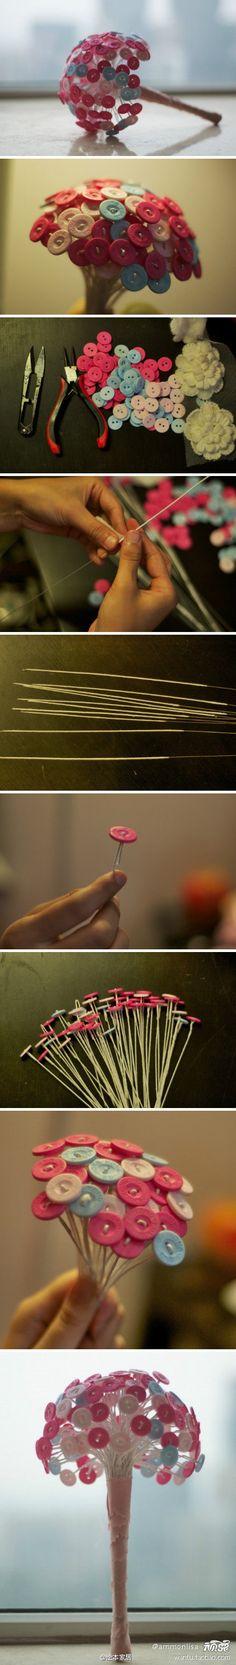 Knopfblume selbst gemacht